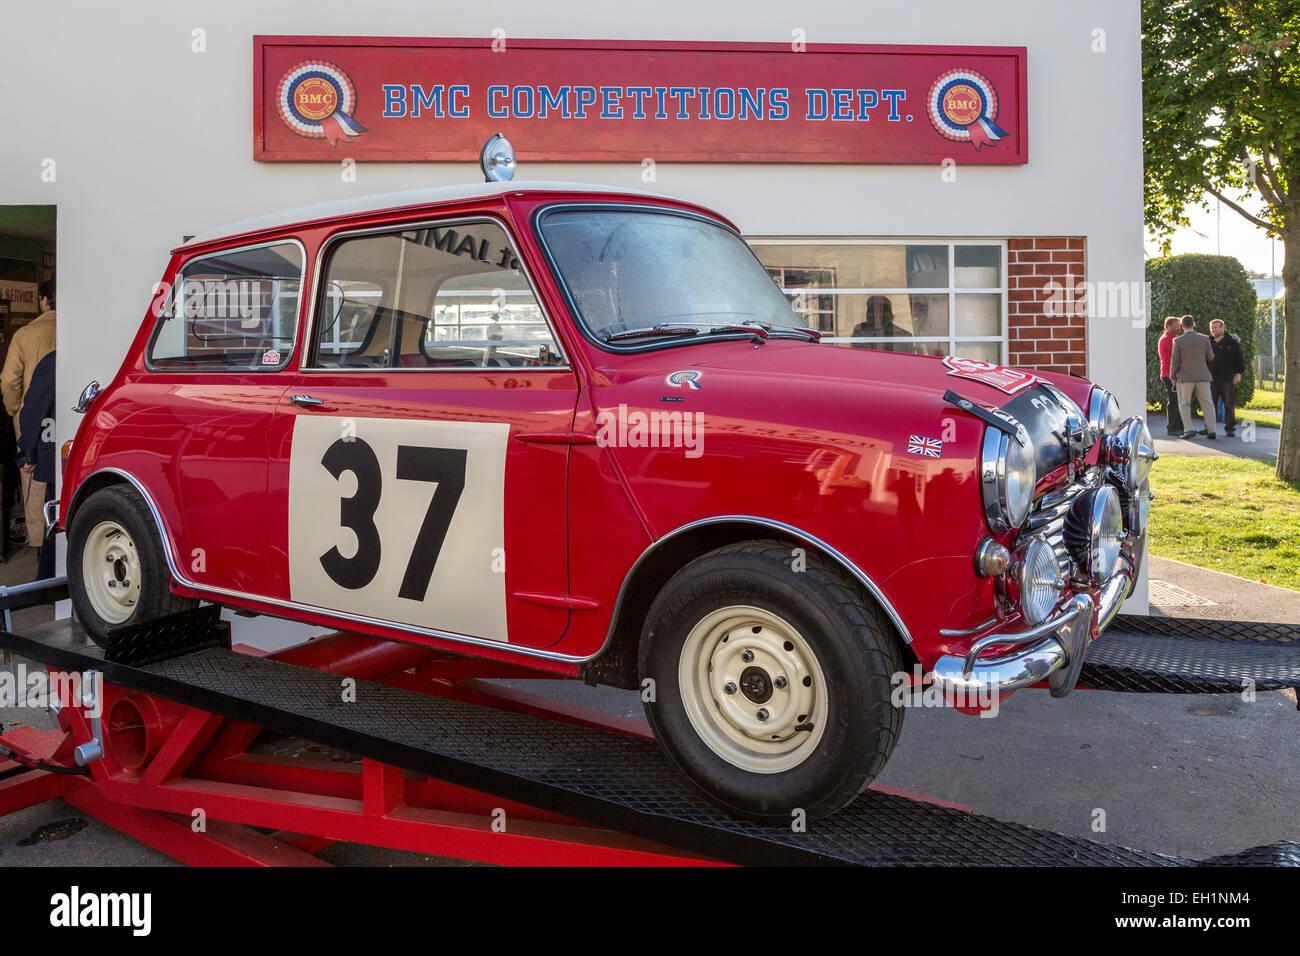 Mini Cooper Roof Rack >> 1964 Mini Cooper S replica of Paddy Hopkirk's Monte Carlo winning Stock Photo: 79329604 - Alamy